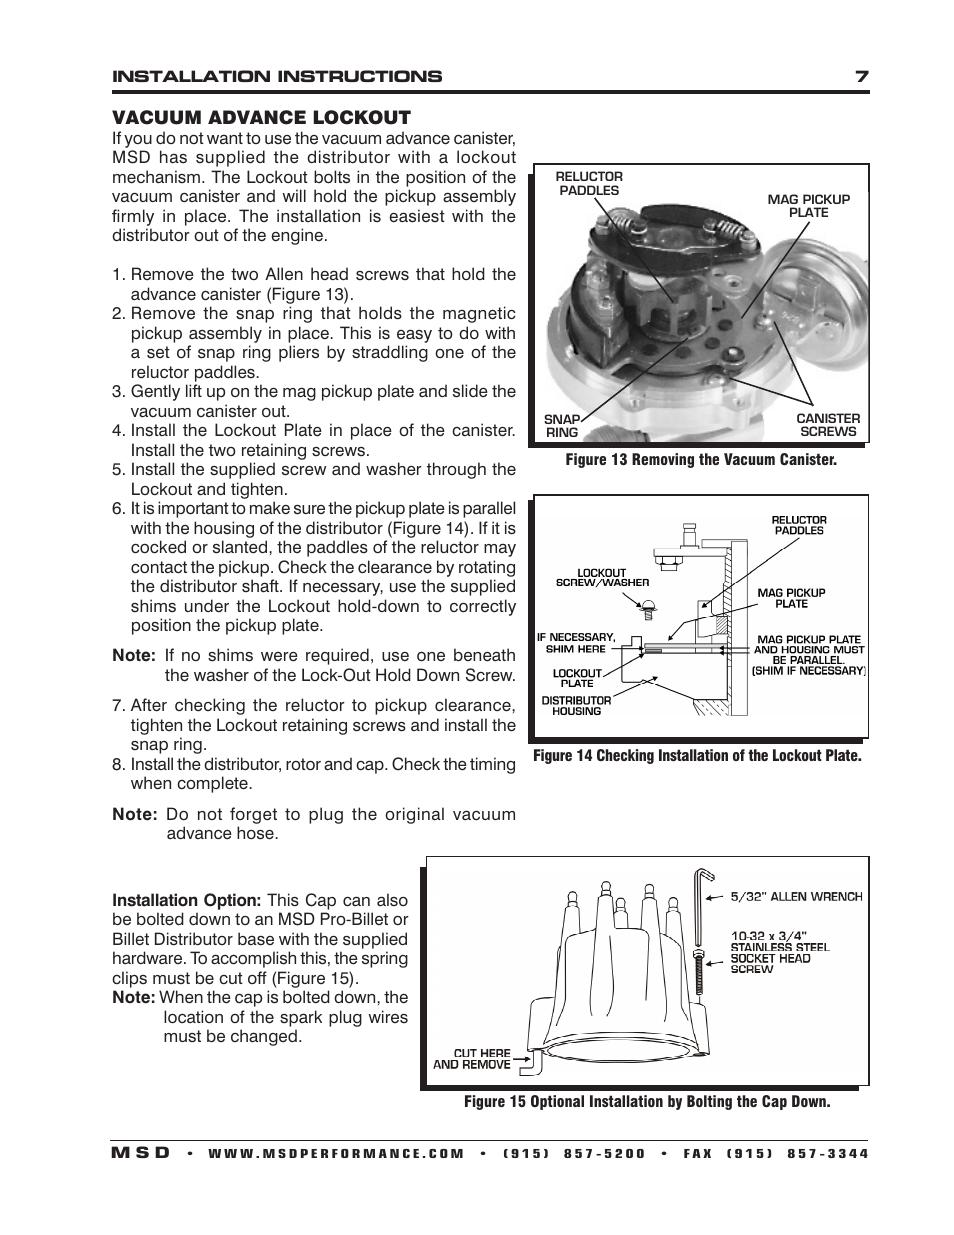 Reluctor Msd Wiring Diagram Engine Control Distributor 8573 Flathead Ford Ready To Run For 49 53 Rh Manualsdir Com 6al 6420 Gm